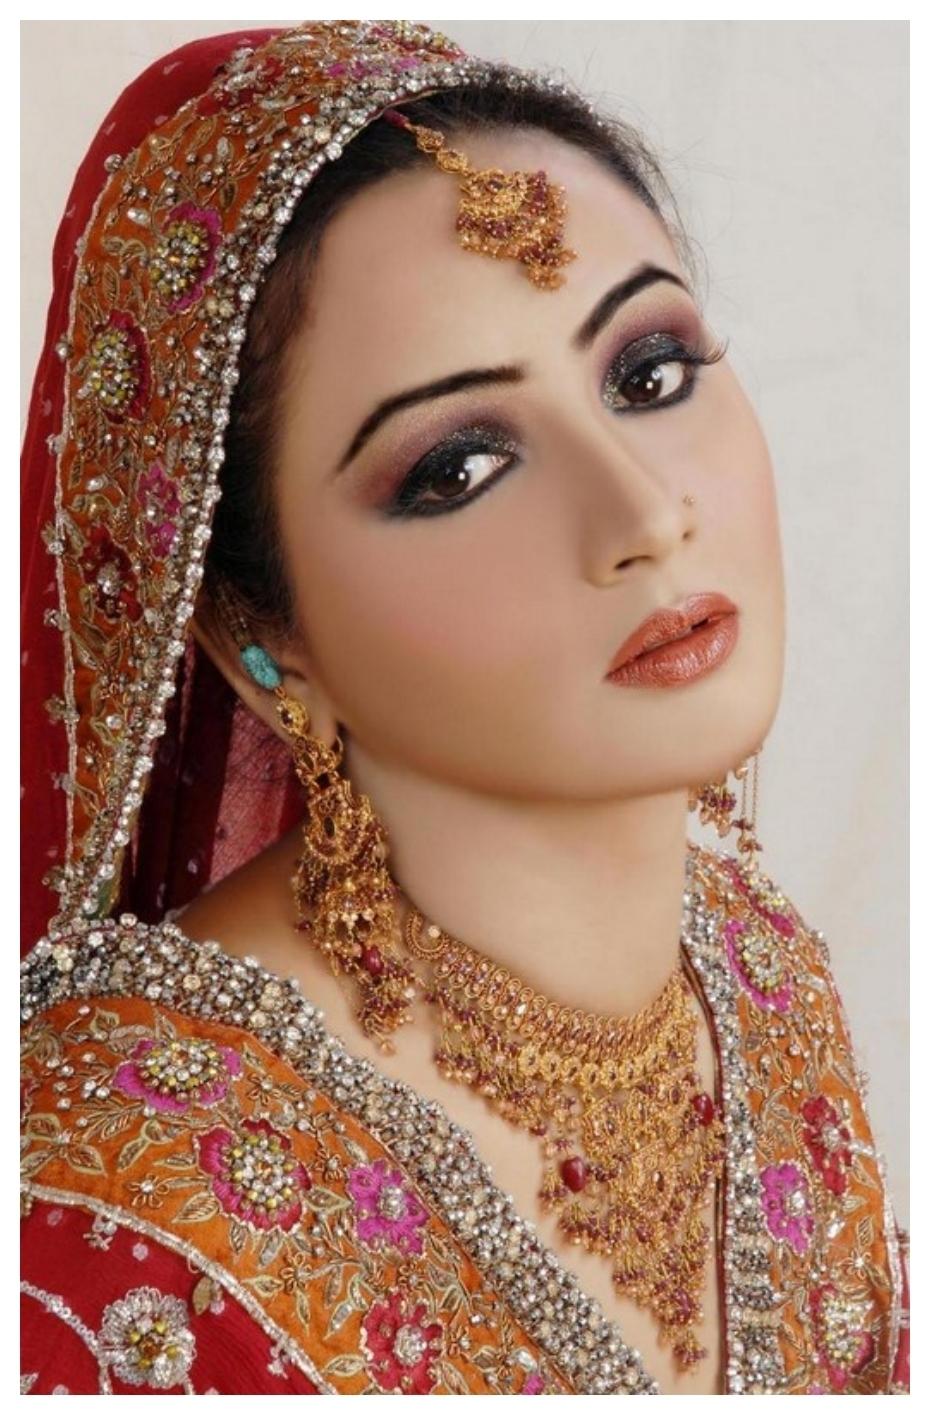 Top Bridal Makeup Ideas In Pakistan 2018 inside Pakistani Bridal Makeup Pictures 2013